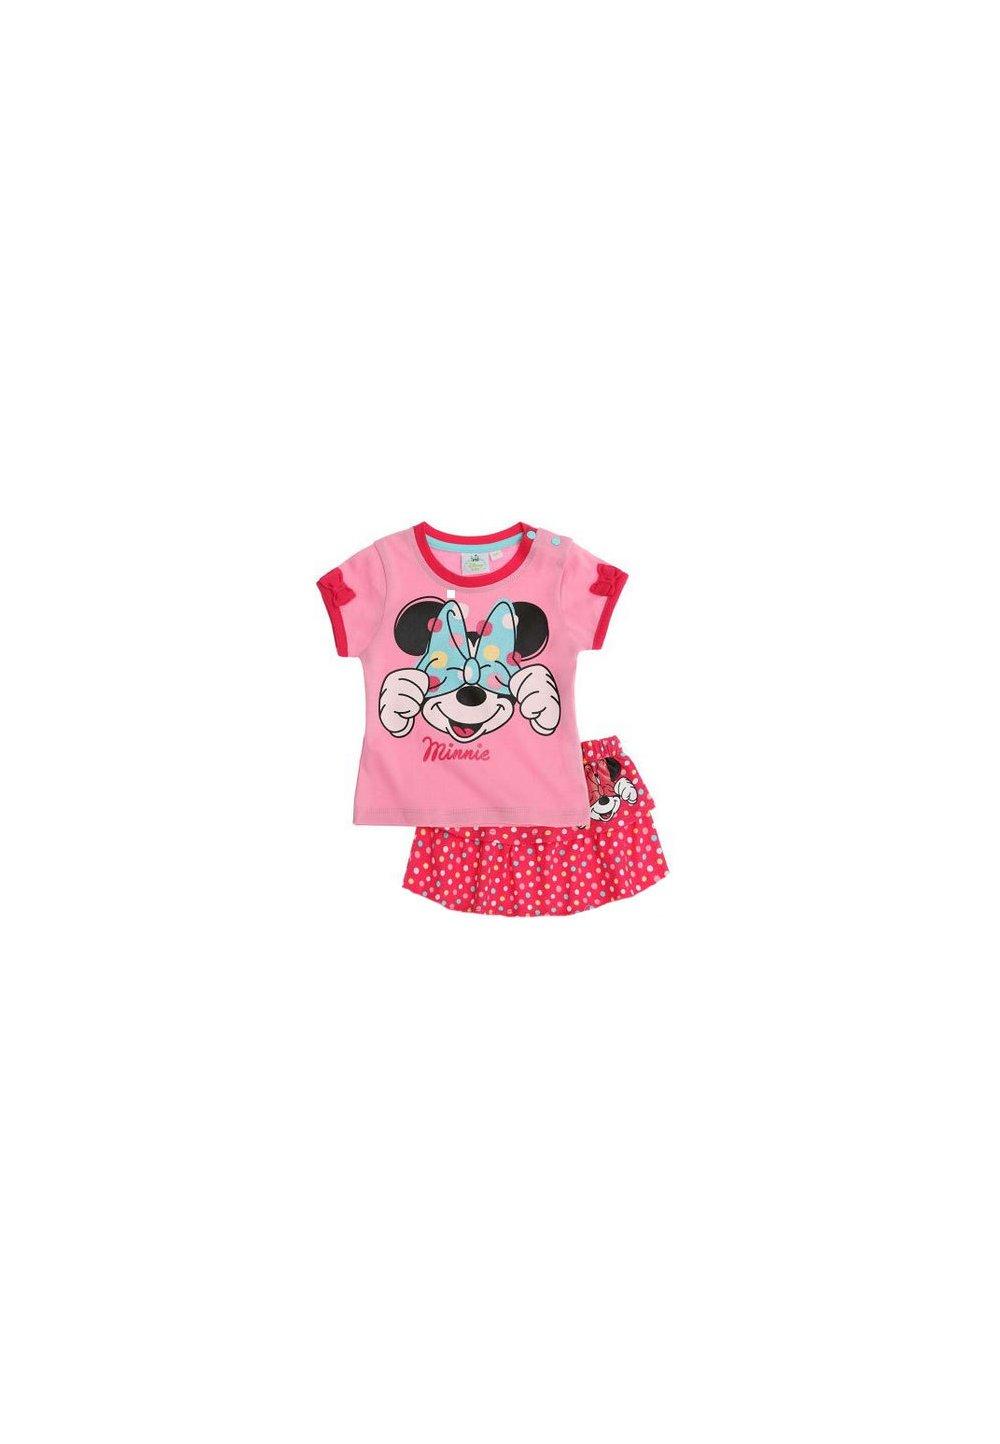 Compleu bebe, Minnie Mouse, roz imagine